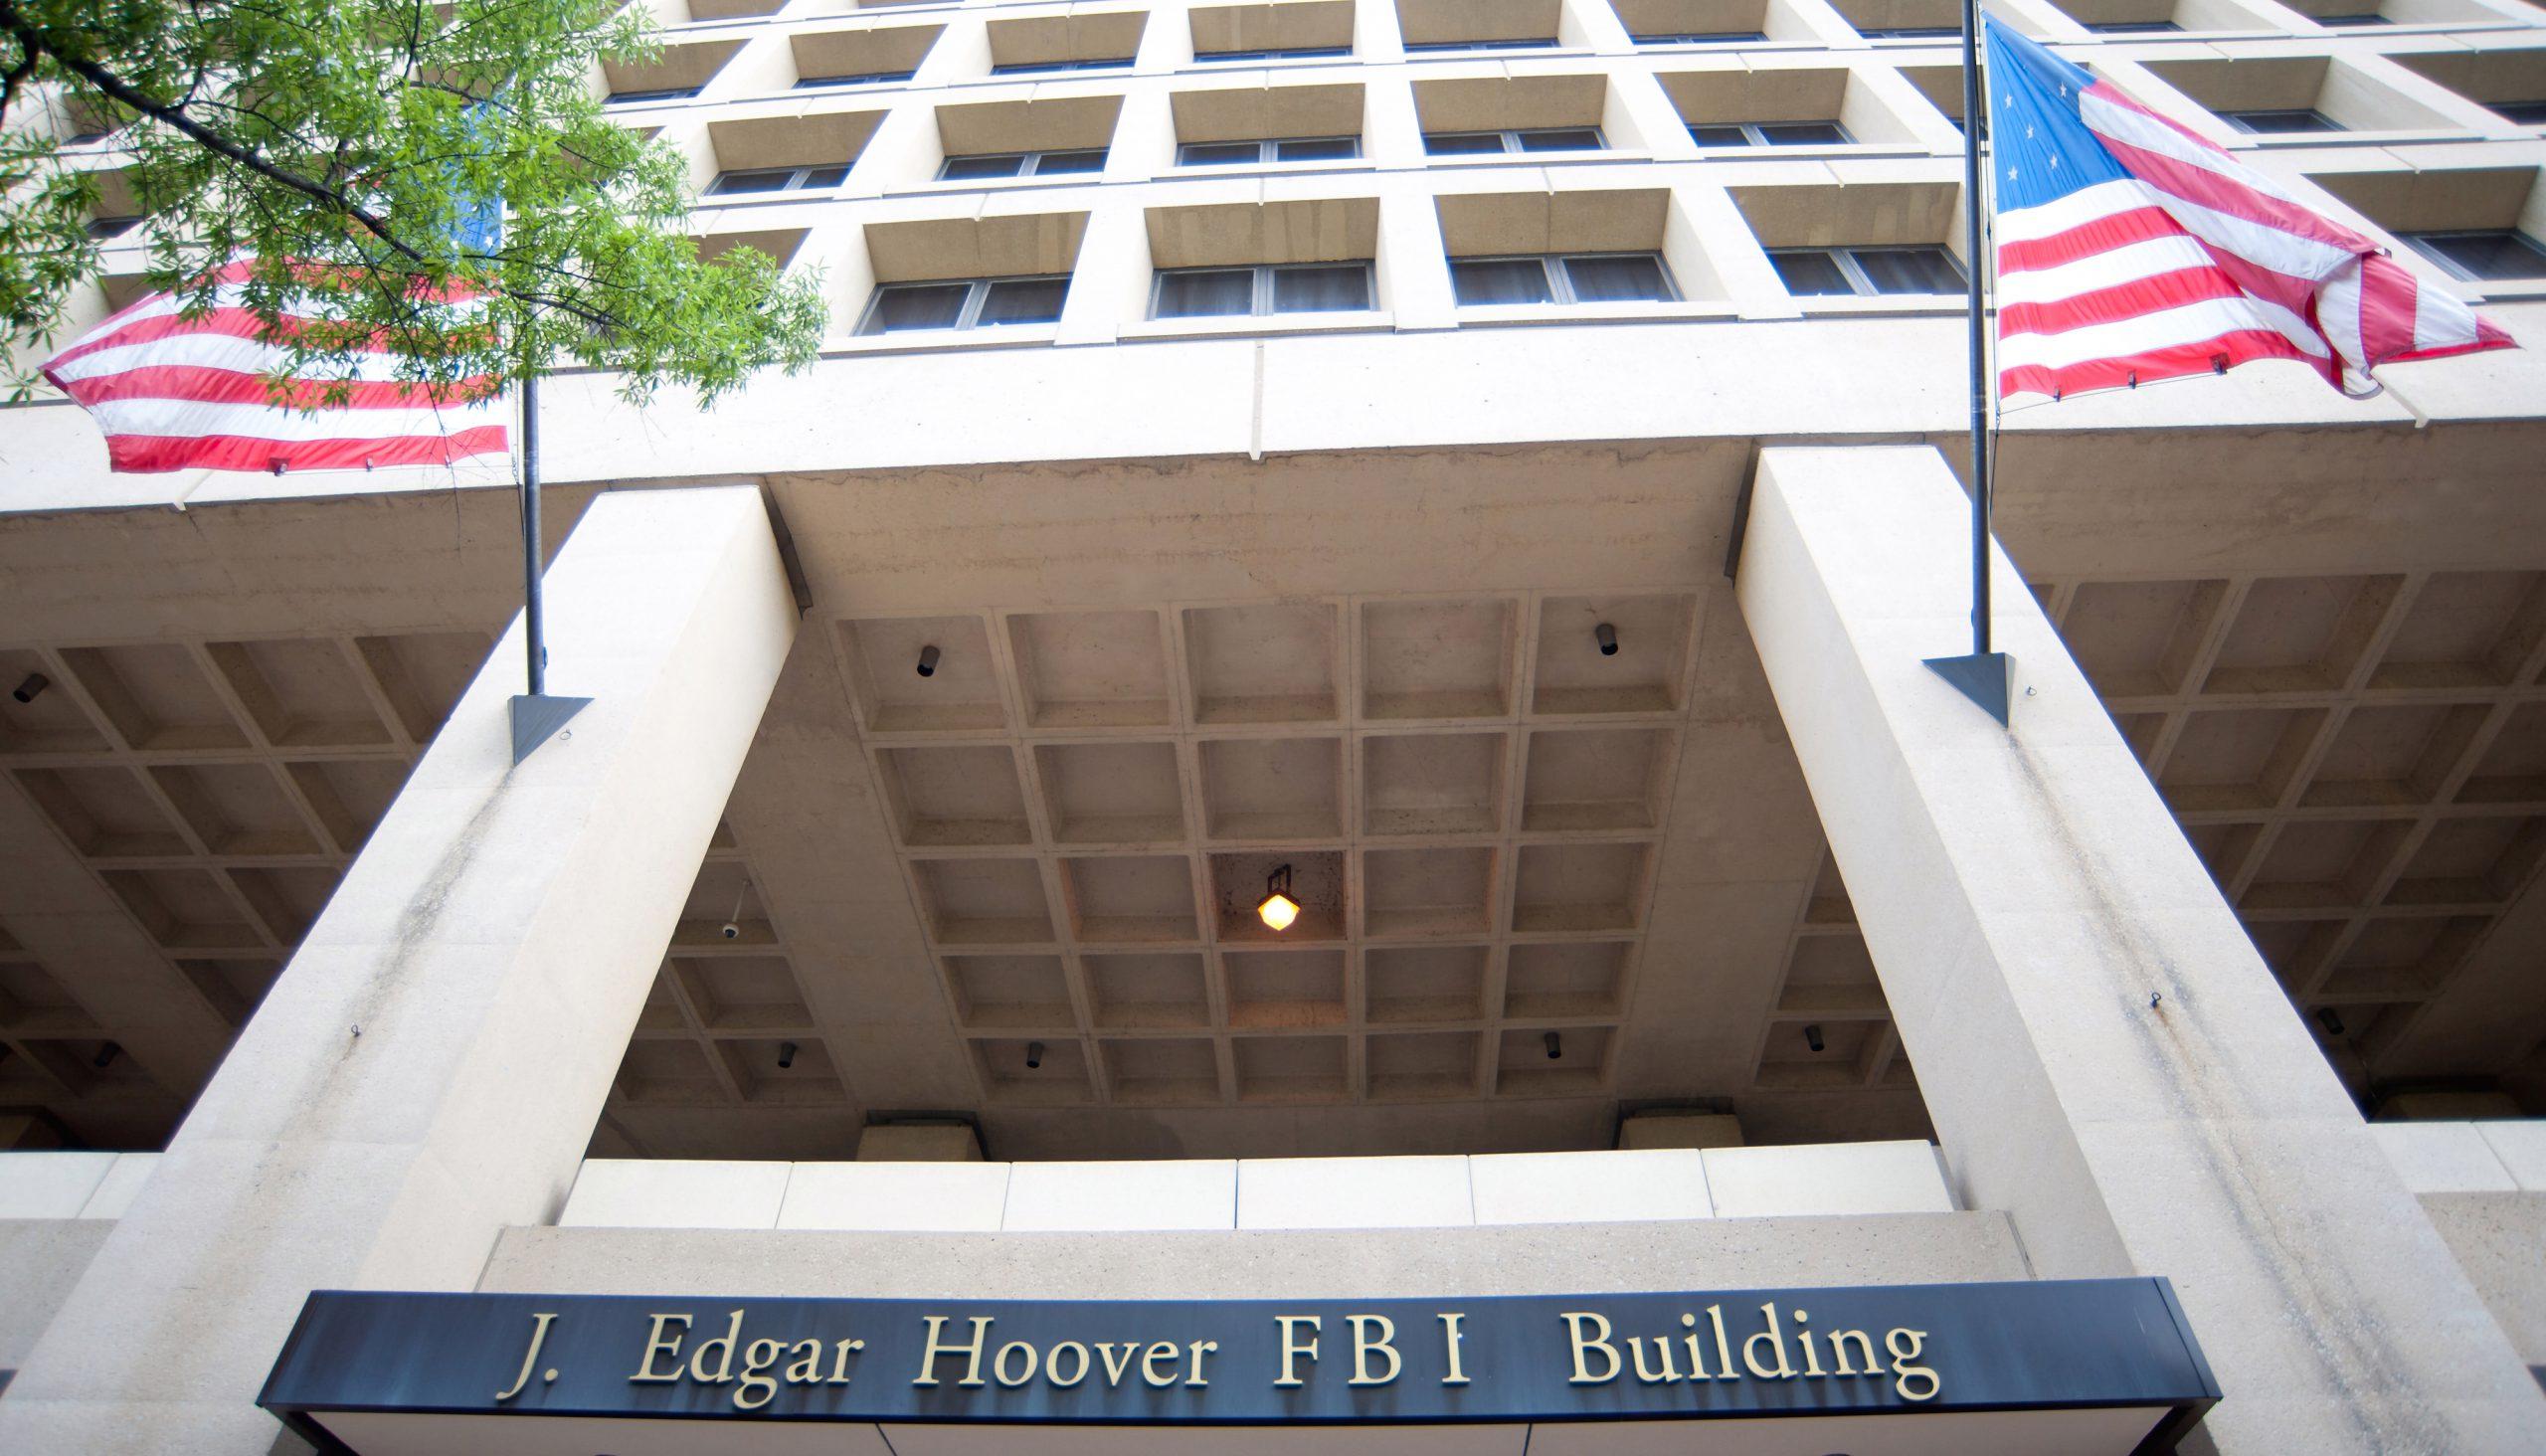 FBI building